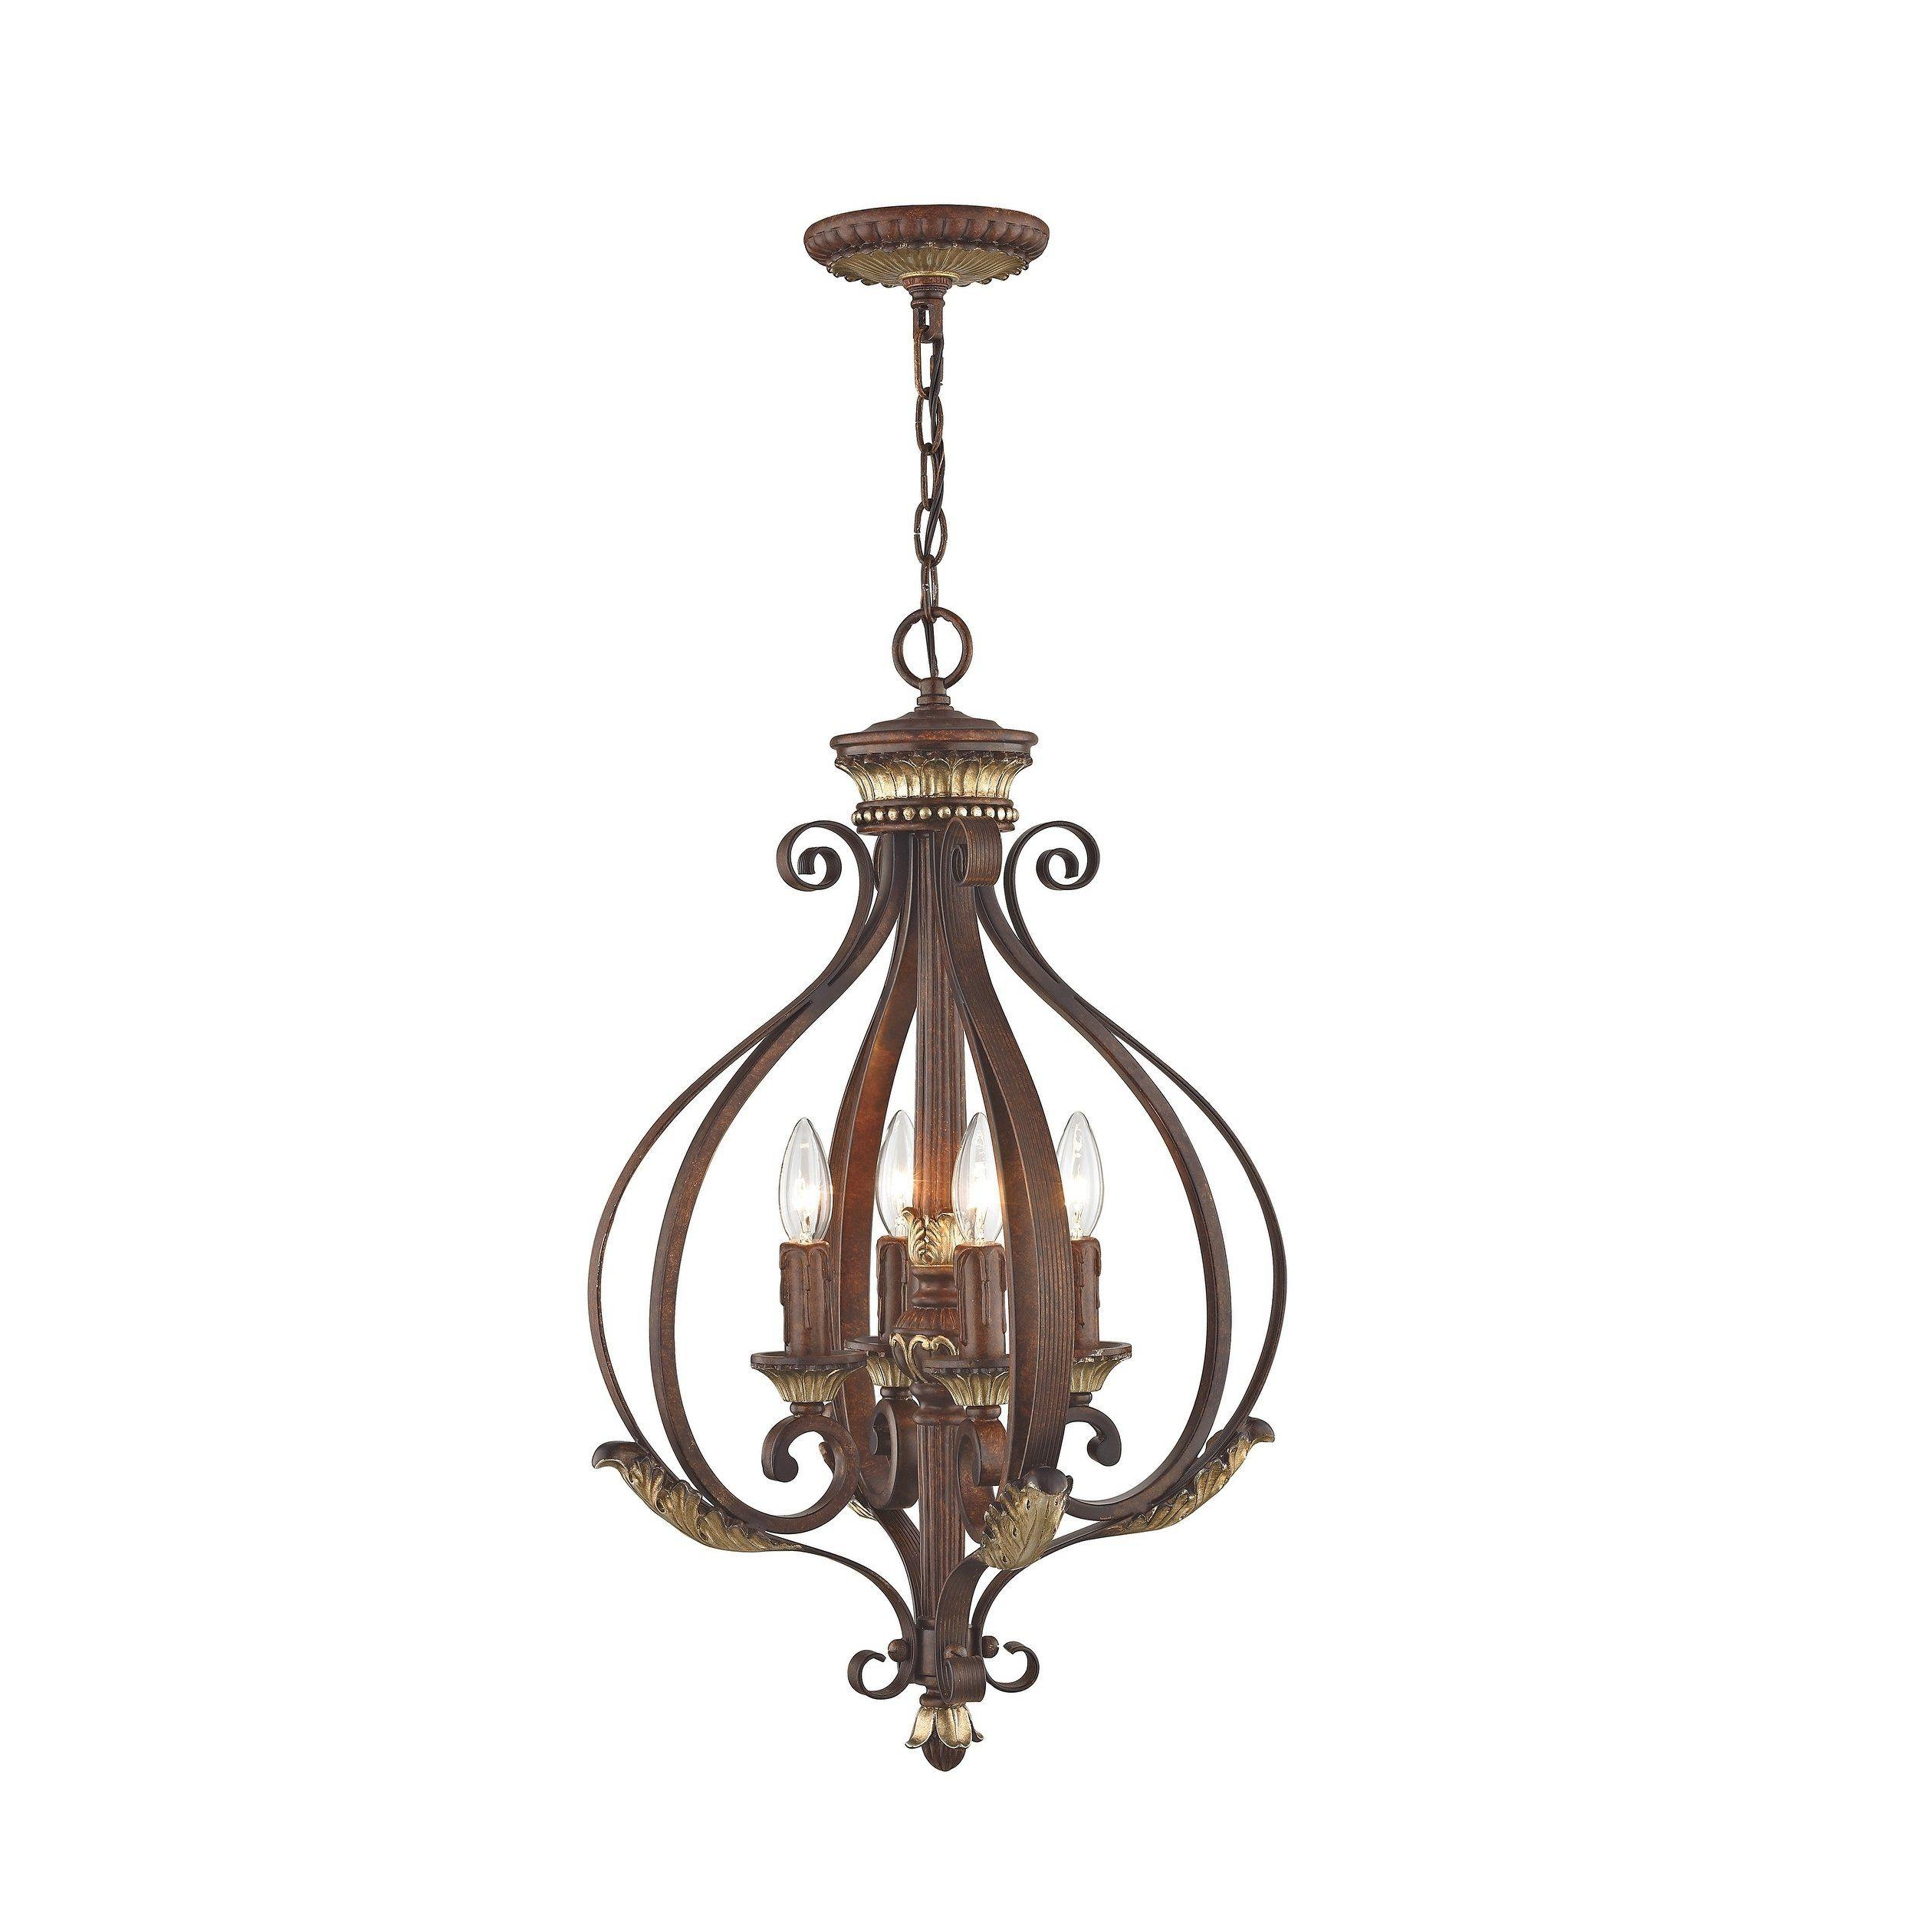 Livex Lighting Villa Verona 4 Light Verona Bronze Aged